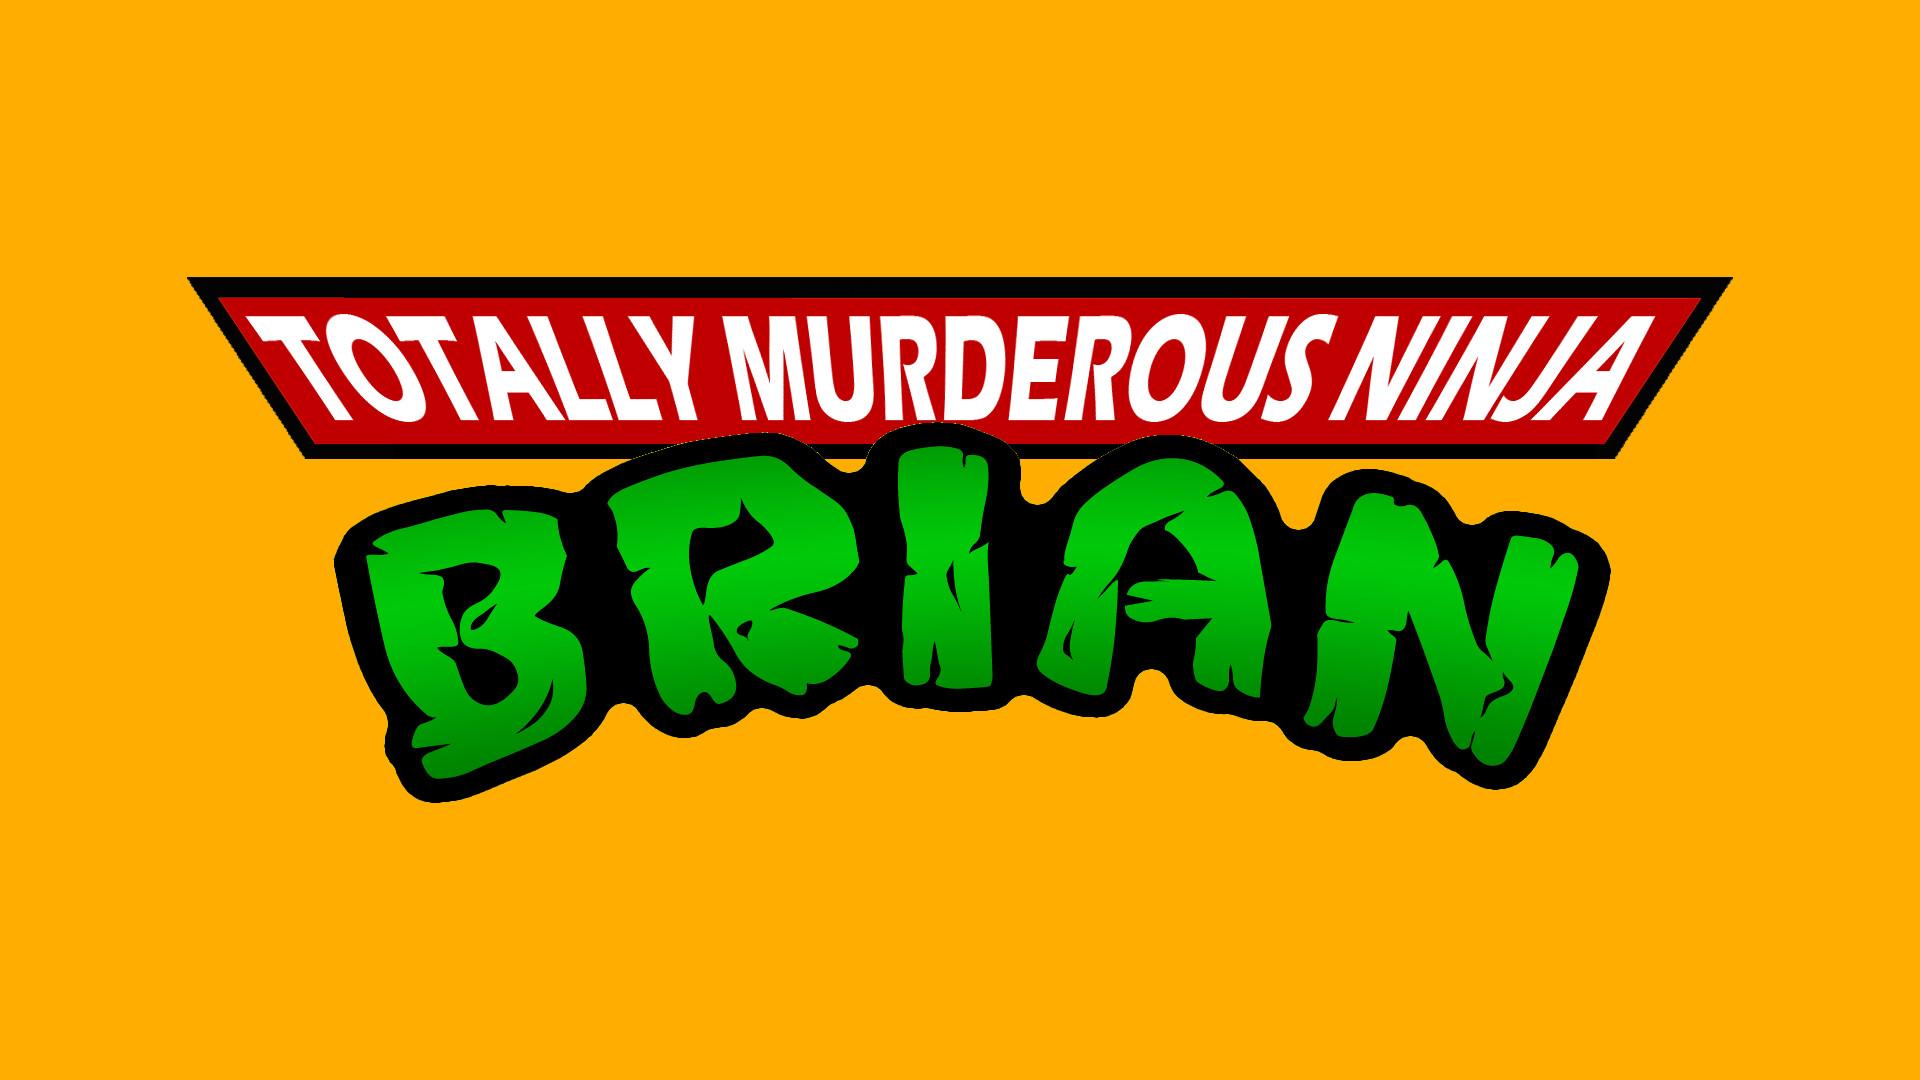 Totally Murderous Ninja Brian wallpaper : gamegrumps